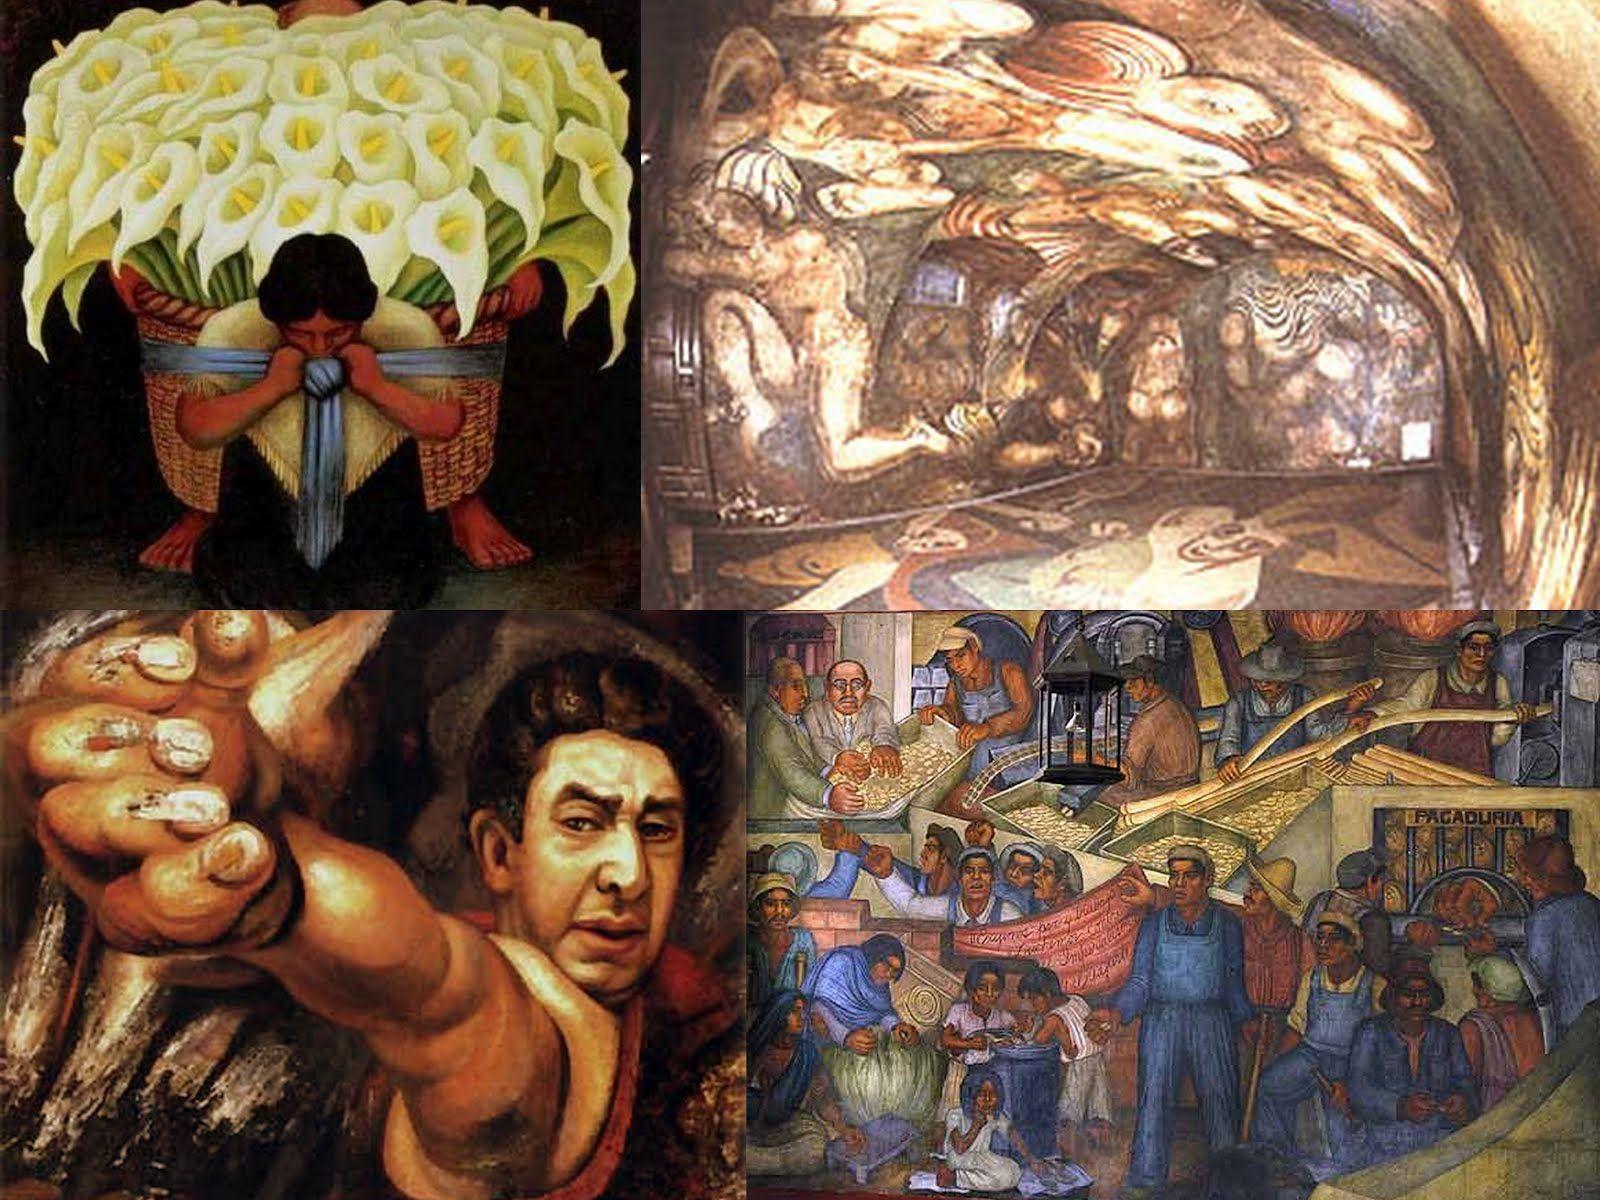 Collages Murales Mexicanos Con Imagenes Arte Mural Murales